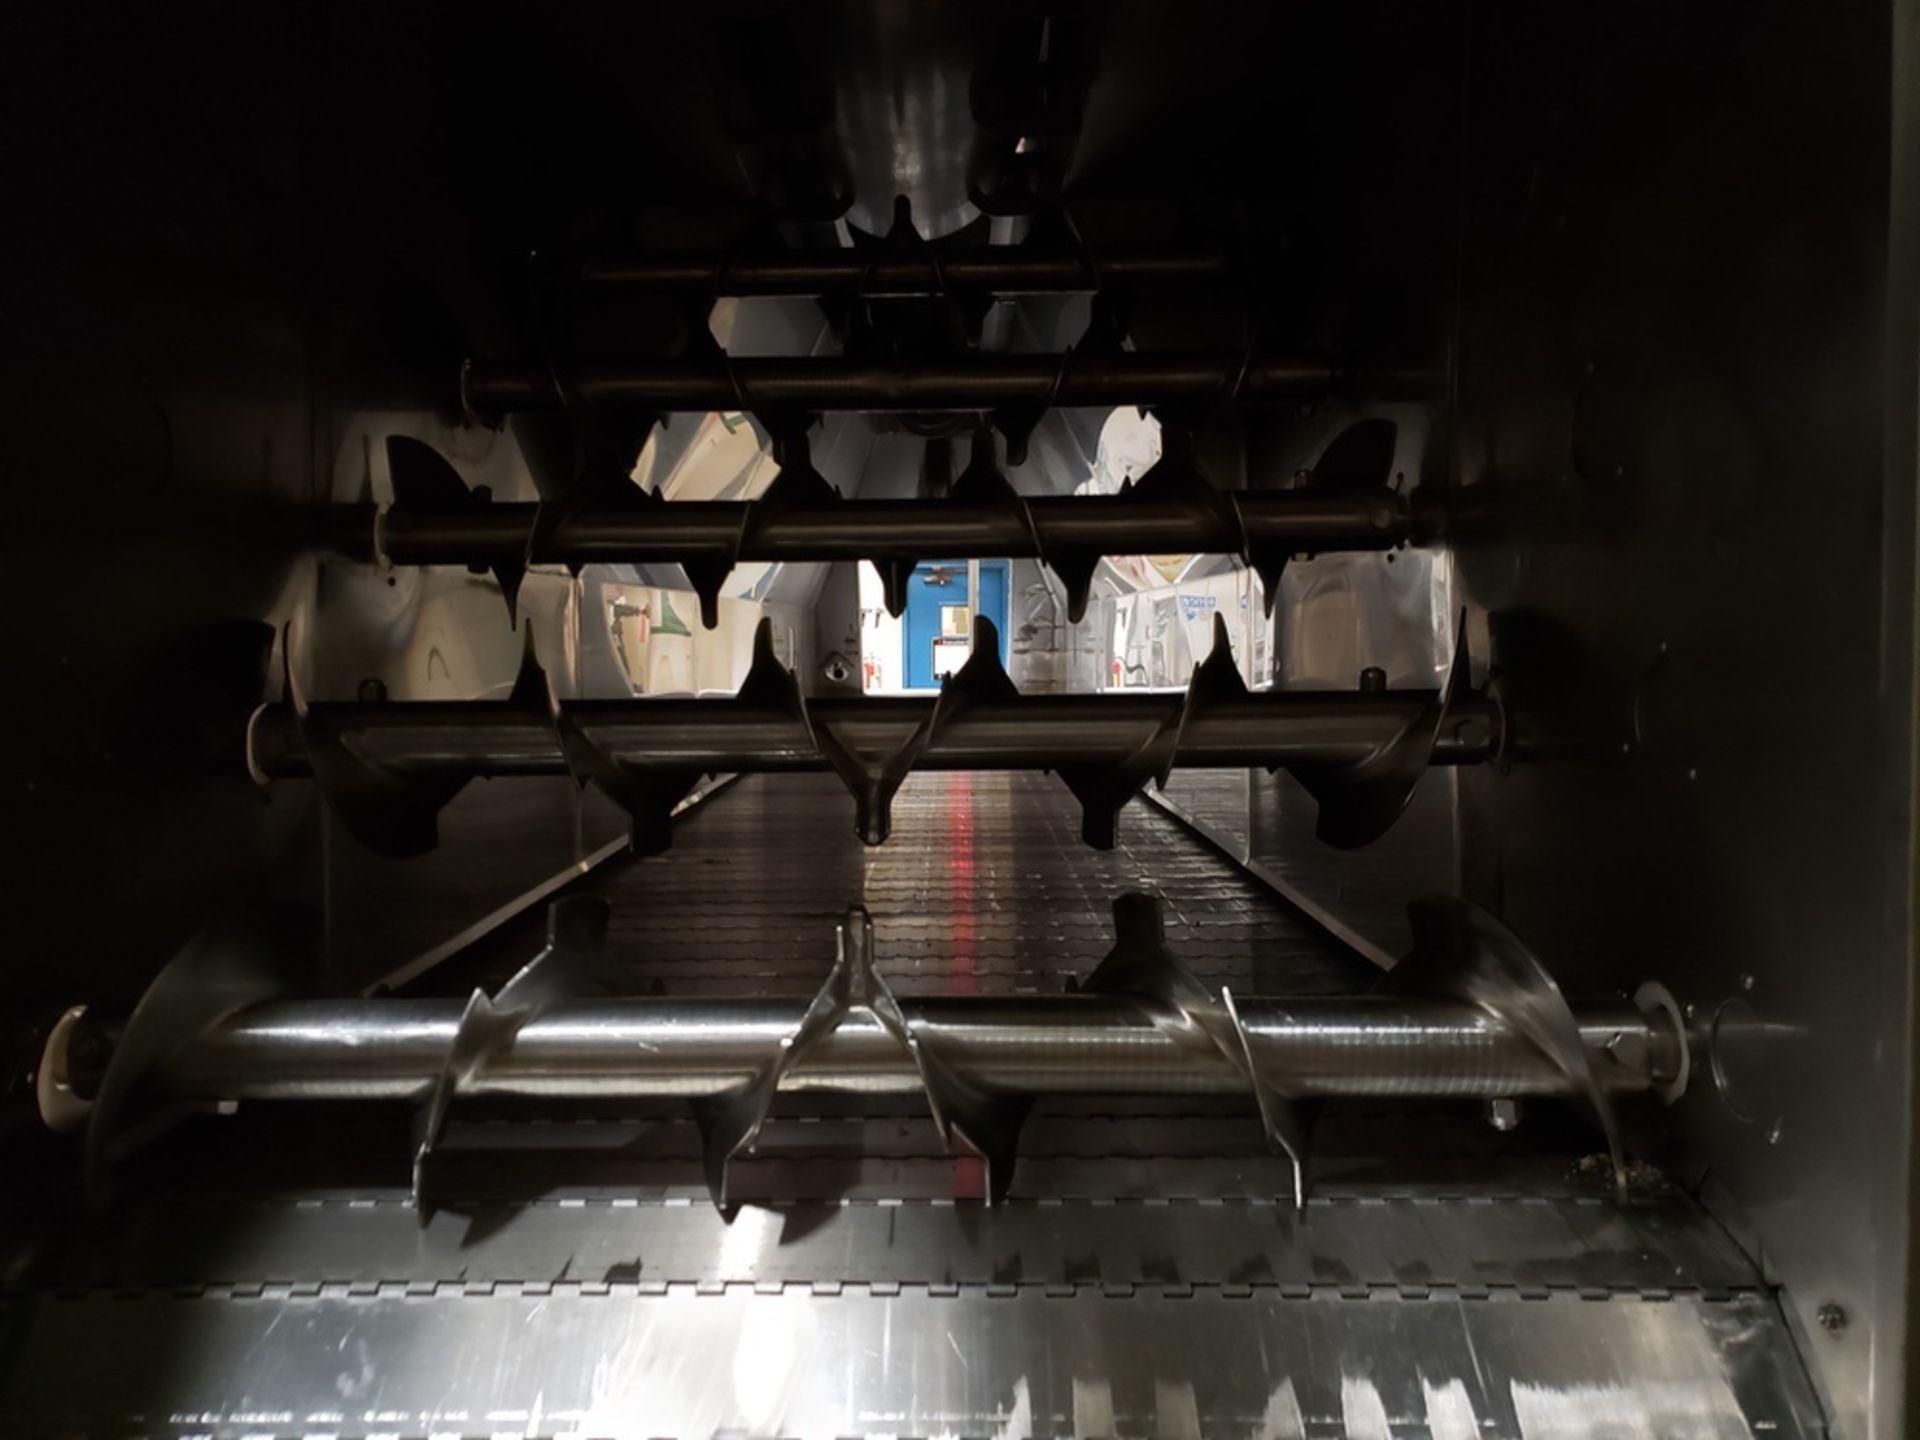 Lot 190 - Bran Drying/Surge Bin, W/ Leveling Scews | Rig Fee: $2100